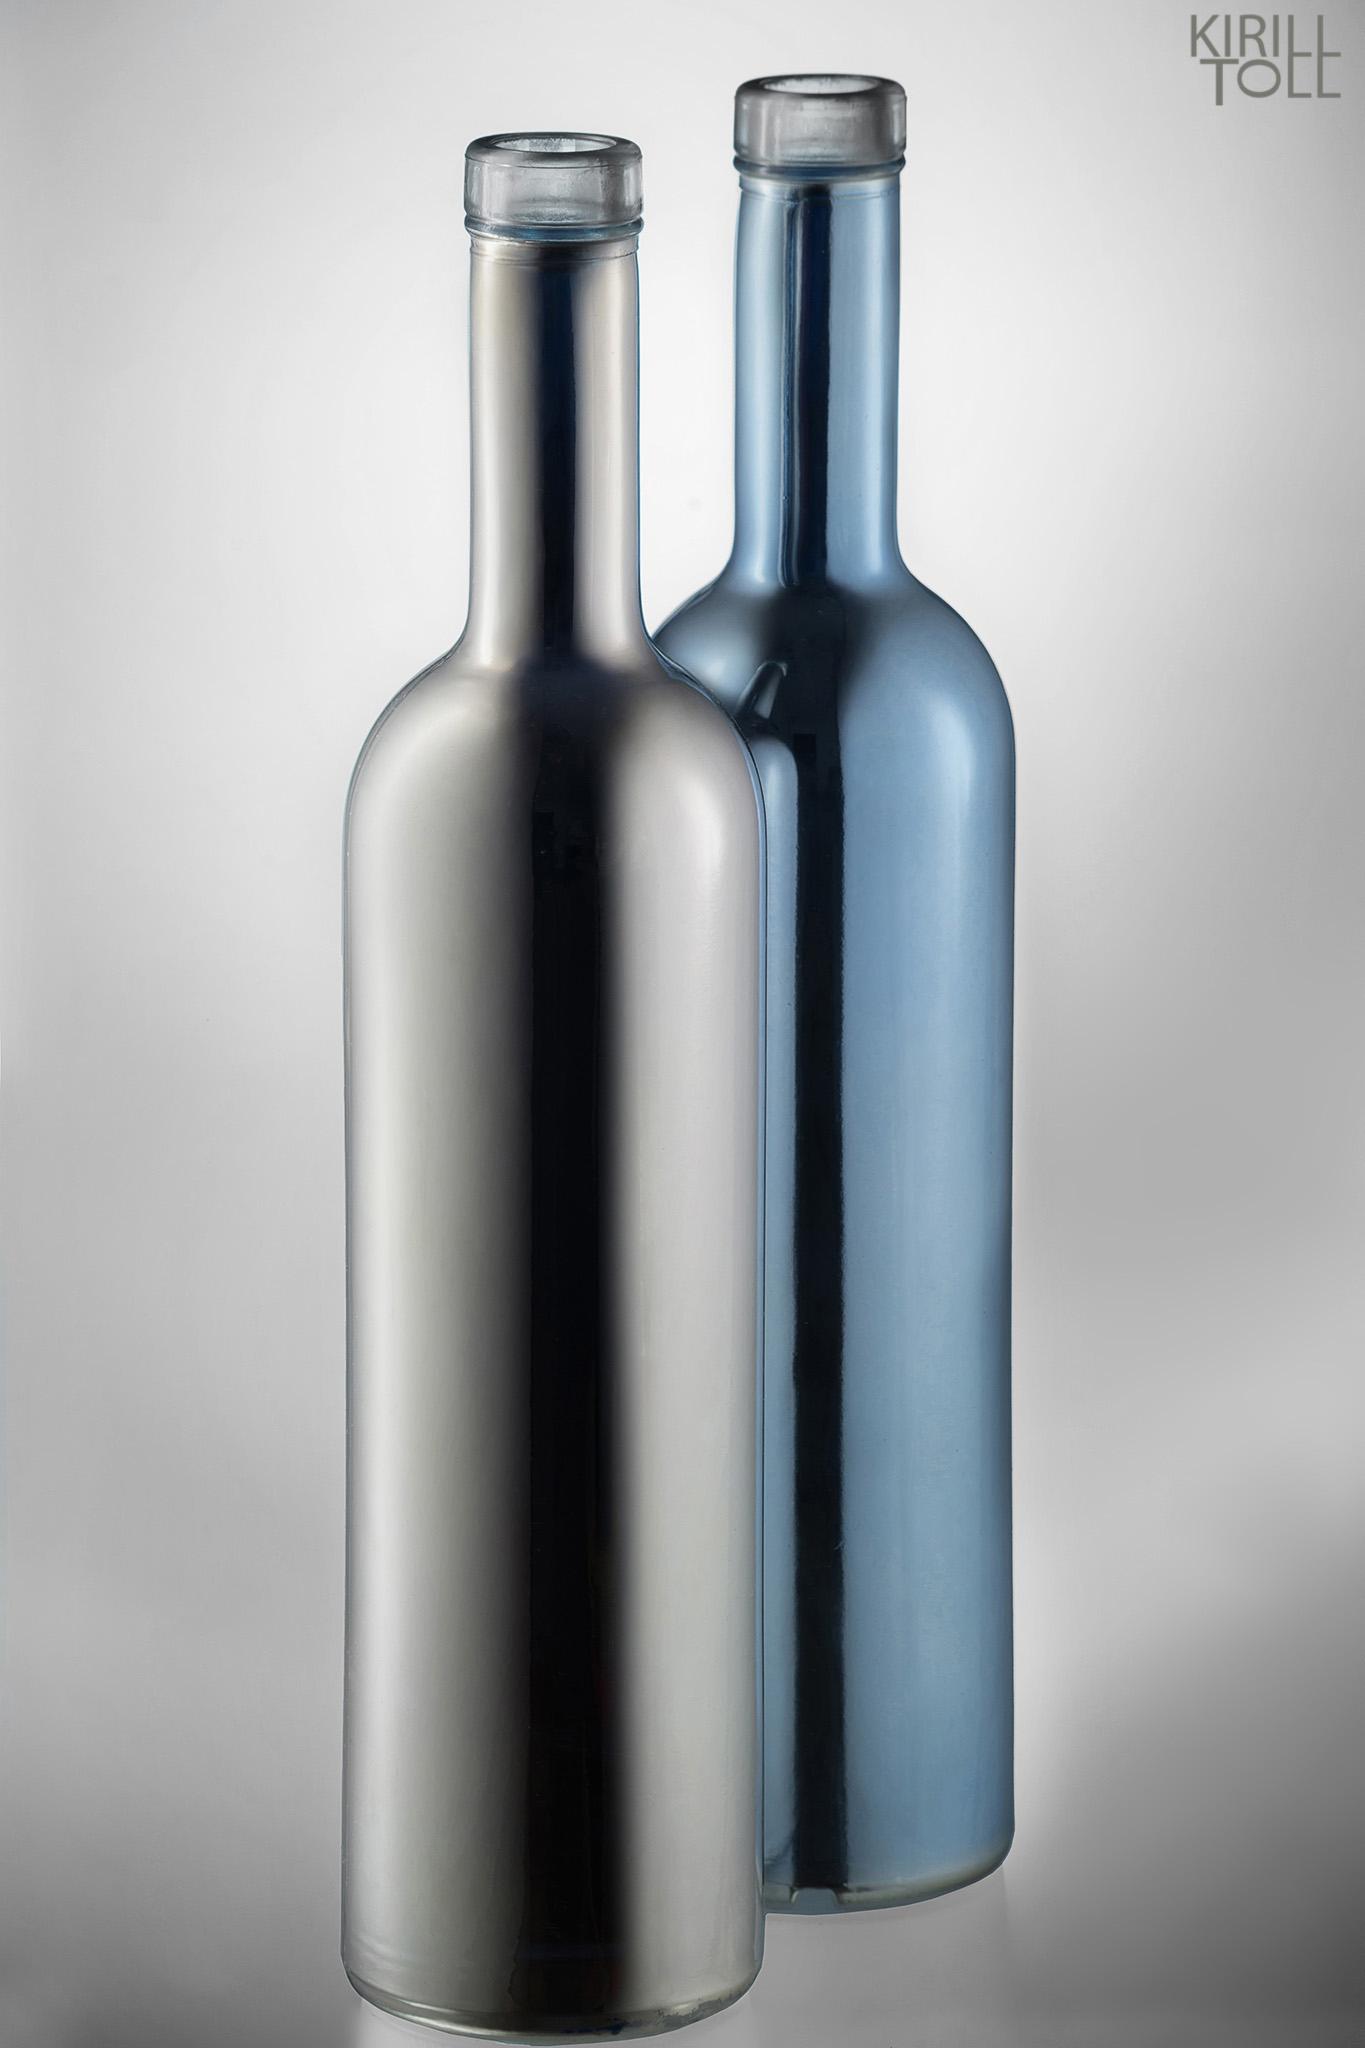 Предметная съемка предметов из стекла ( predmetnaya semka predmetov iz stekla   )